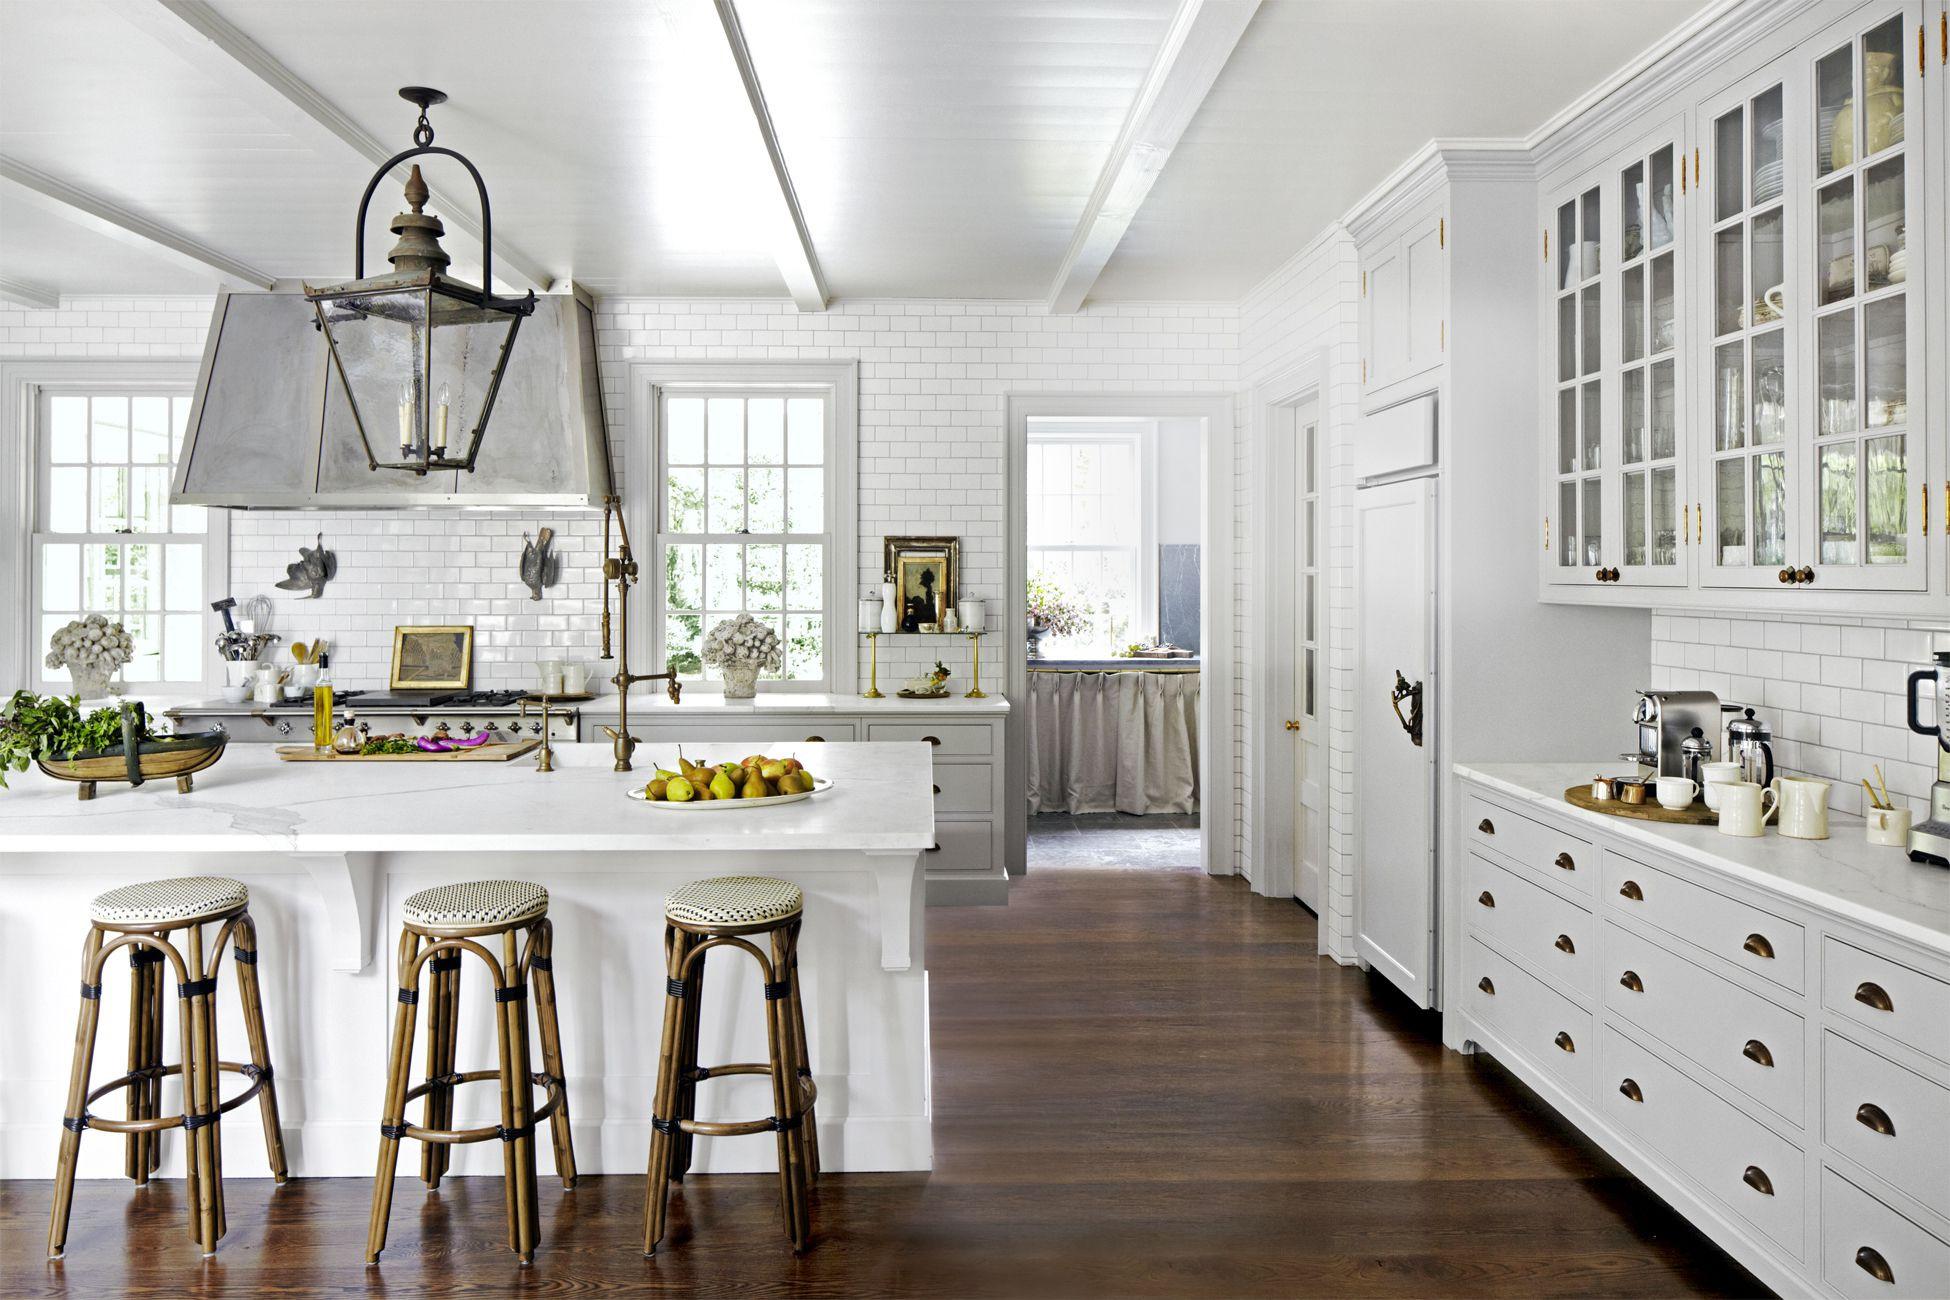 Hardwood Floor Trends 2018 Of 8 Gorgeous Kitchen Trends that Will Be Huge In 2018 Throughout 1483474310 Kitchen Reinvention Dark Floors 0117